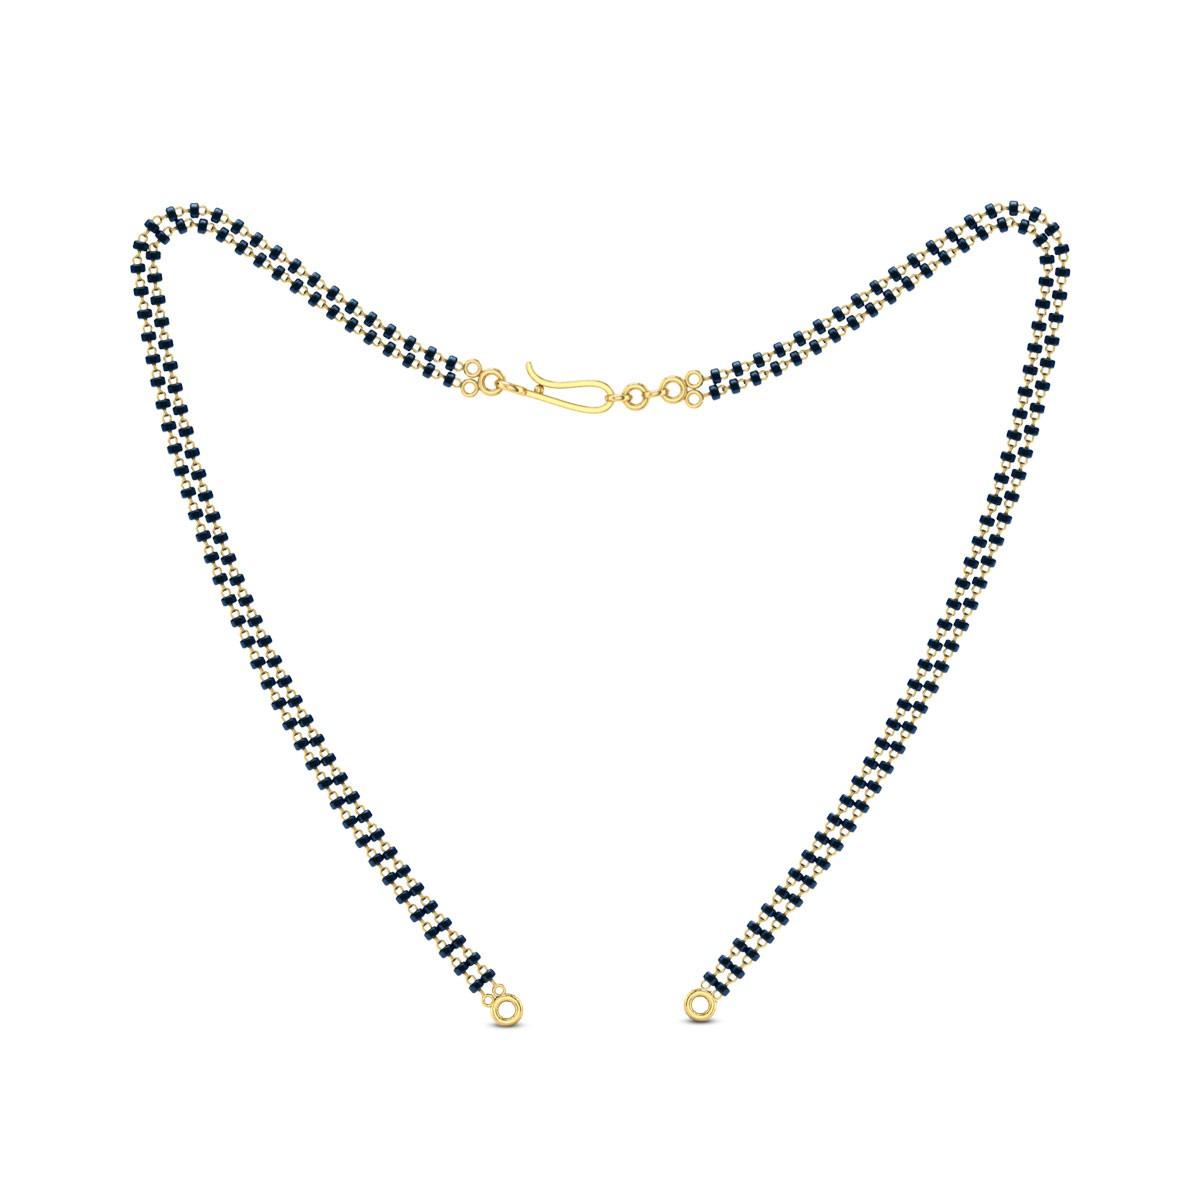 Mangalsutra chain 20 inch